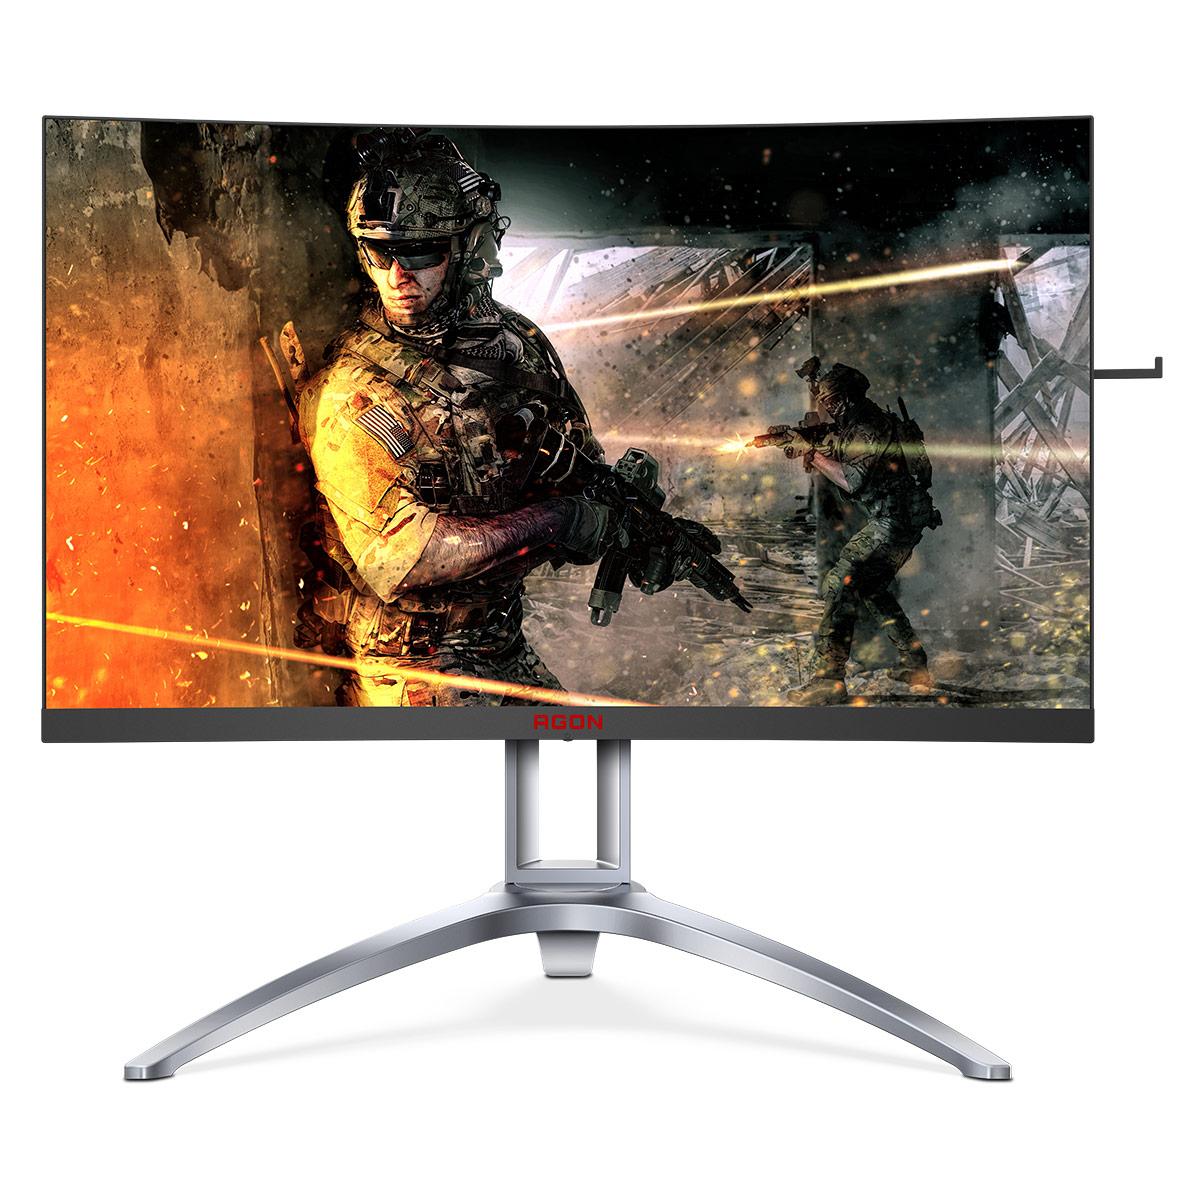 "Ecran PC AOC 27"" LED - AGON AG273QCX 2560 x 1440 pixels - 1 ms (MPRT) - Format large 16/9 - Dalle VA incurvée - 144 Hz - HDR - DisplayPort - HDMI - FreeSync2 - Hub USB 3.0 - Argent/Noir"